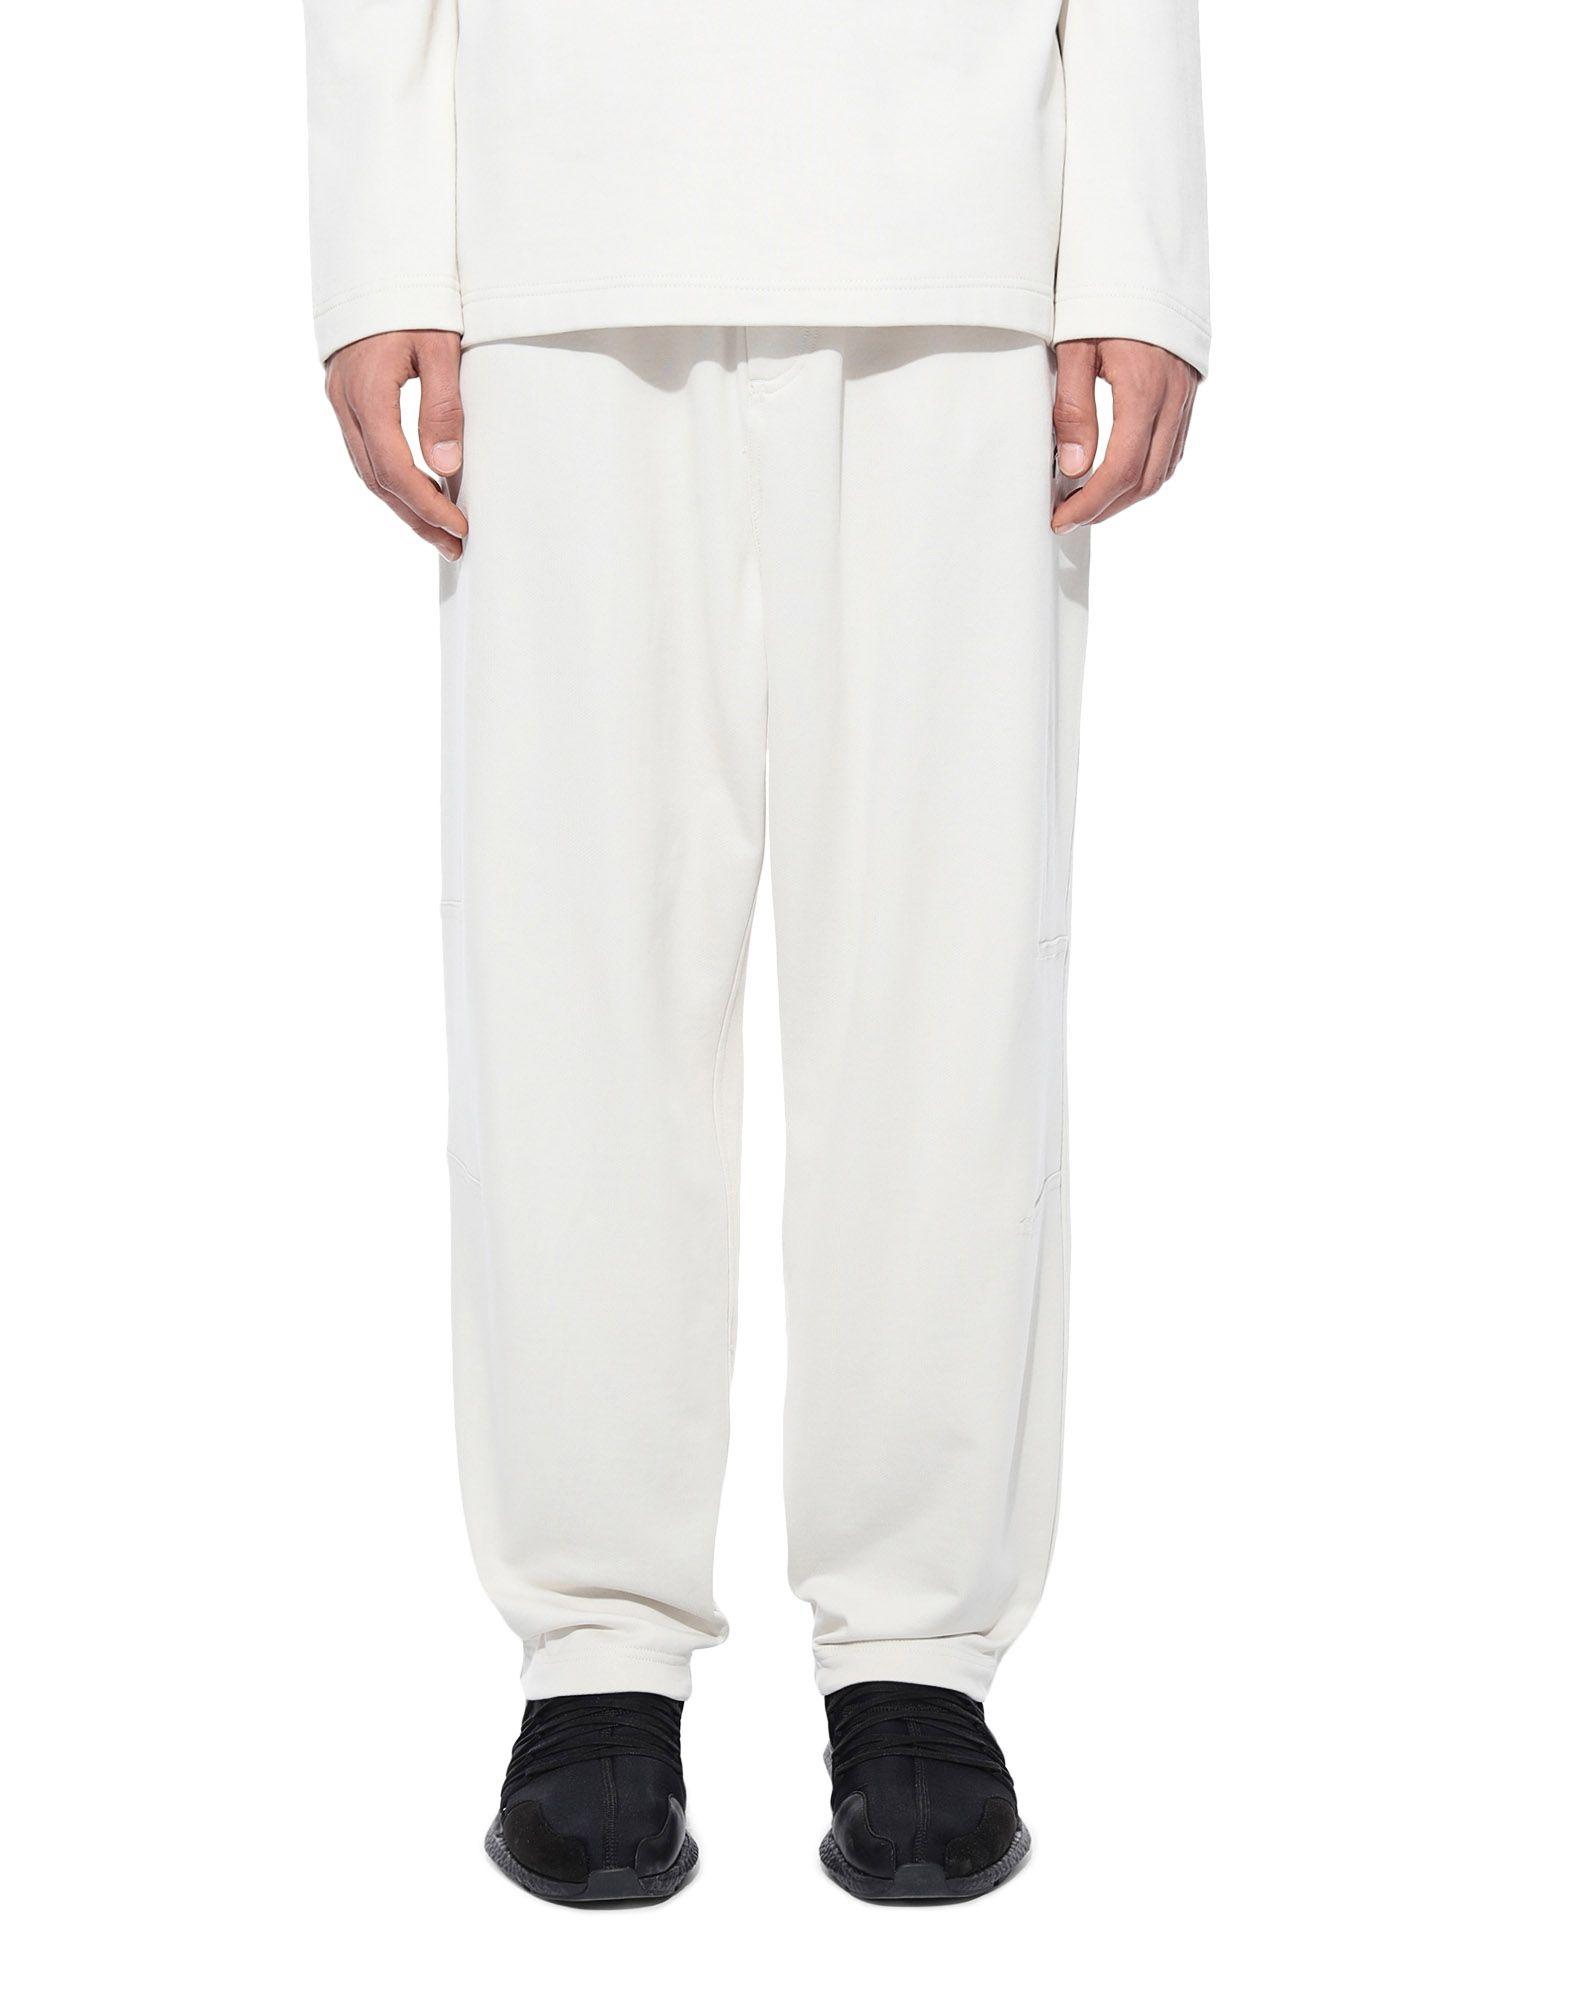 Y-3 Y-3 Sashiko Pants Sweatpants Man r